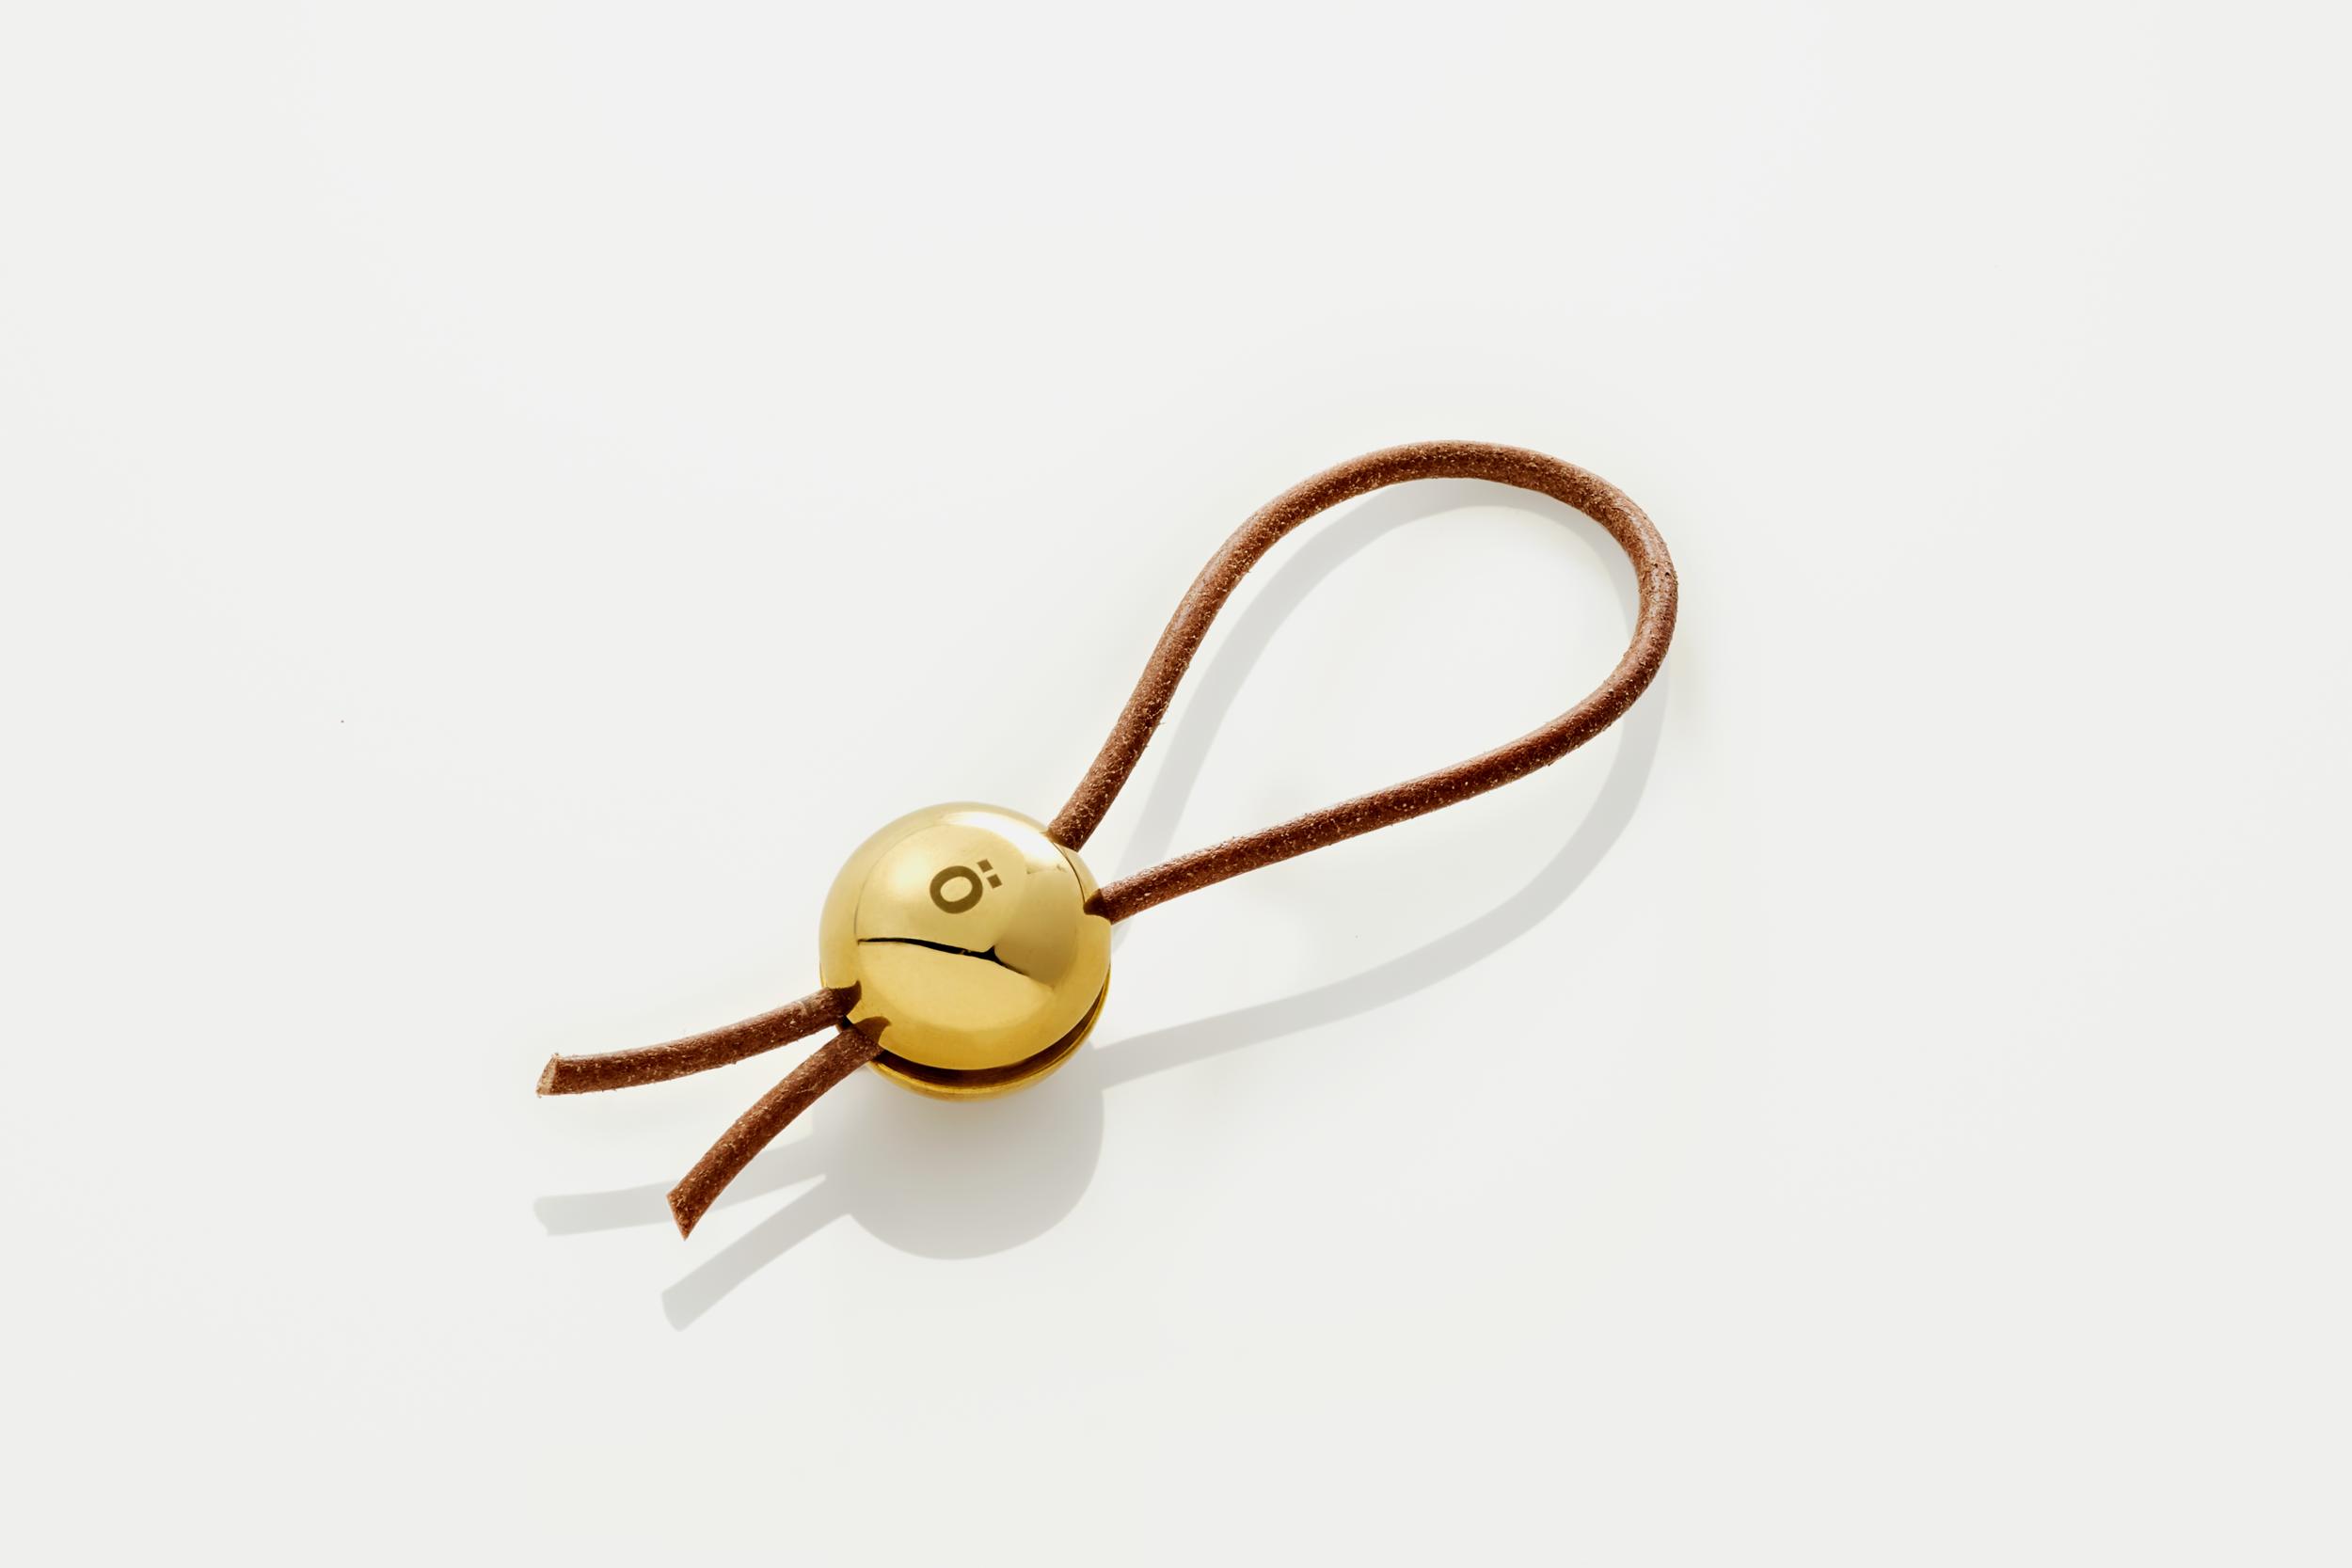 Nördic nøglering - 1 stk, 28 mmRustfrit stål, blank, naturligDesign by H O W, Magnus JørgensenArt. nr.: 90512